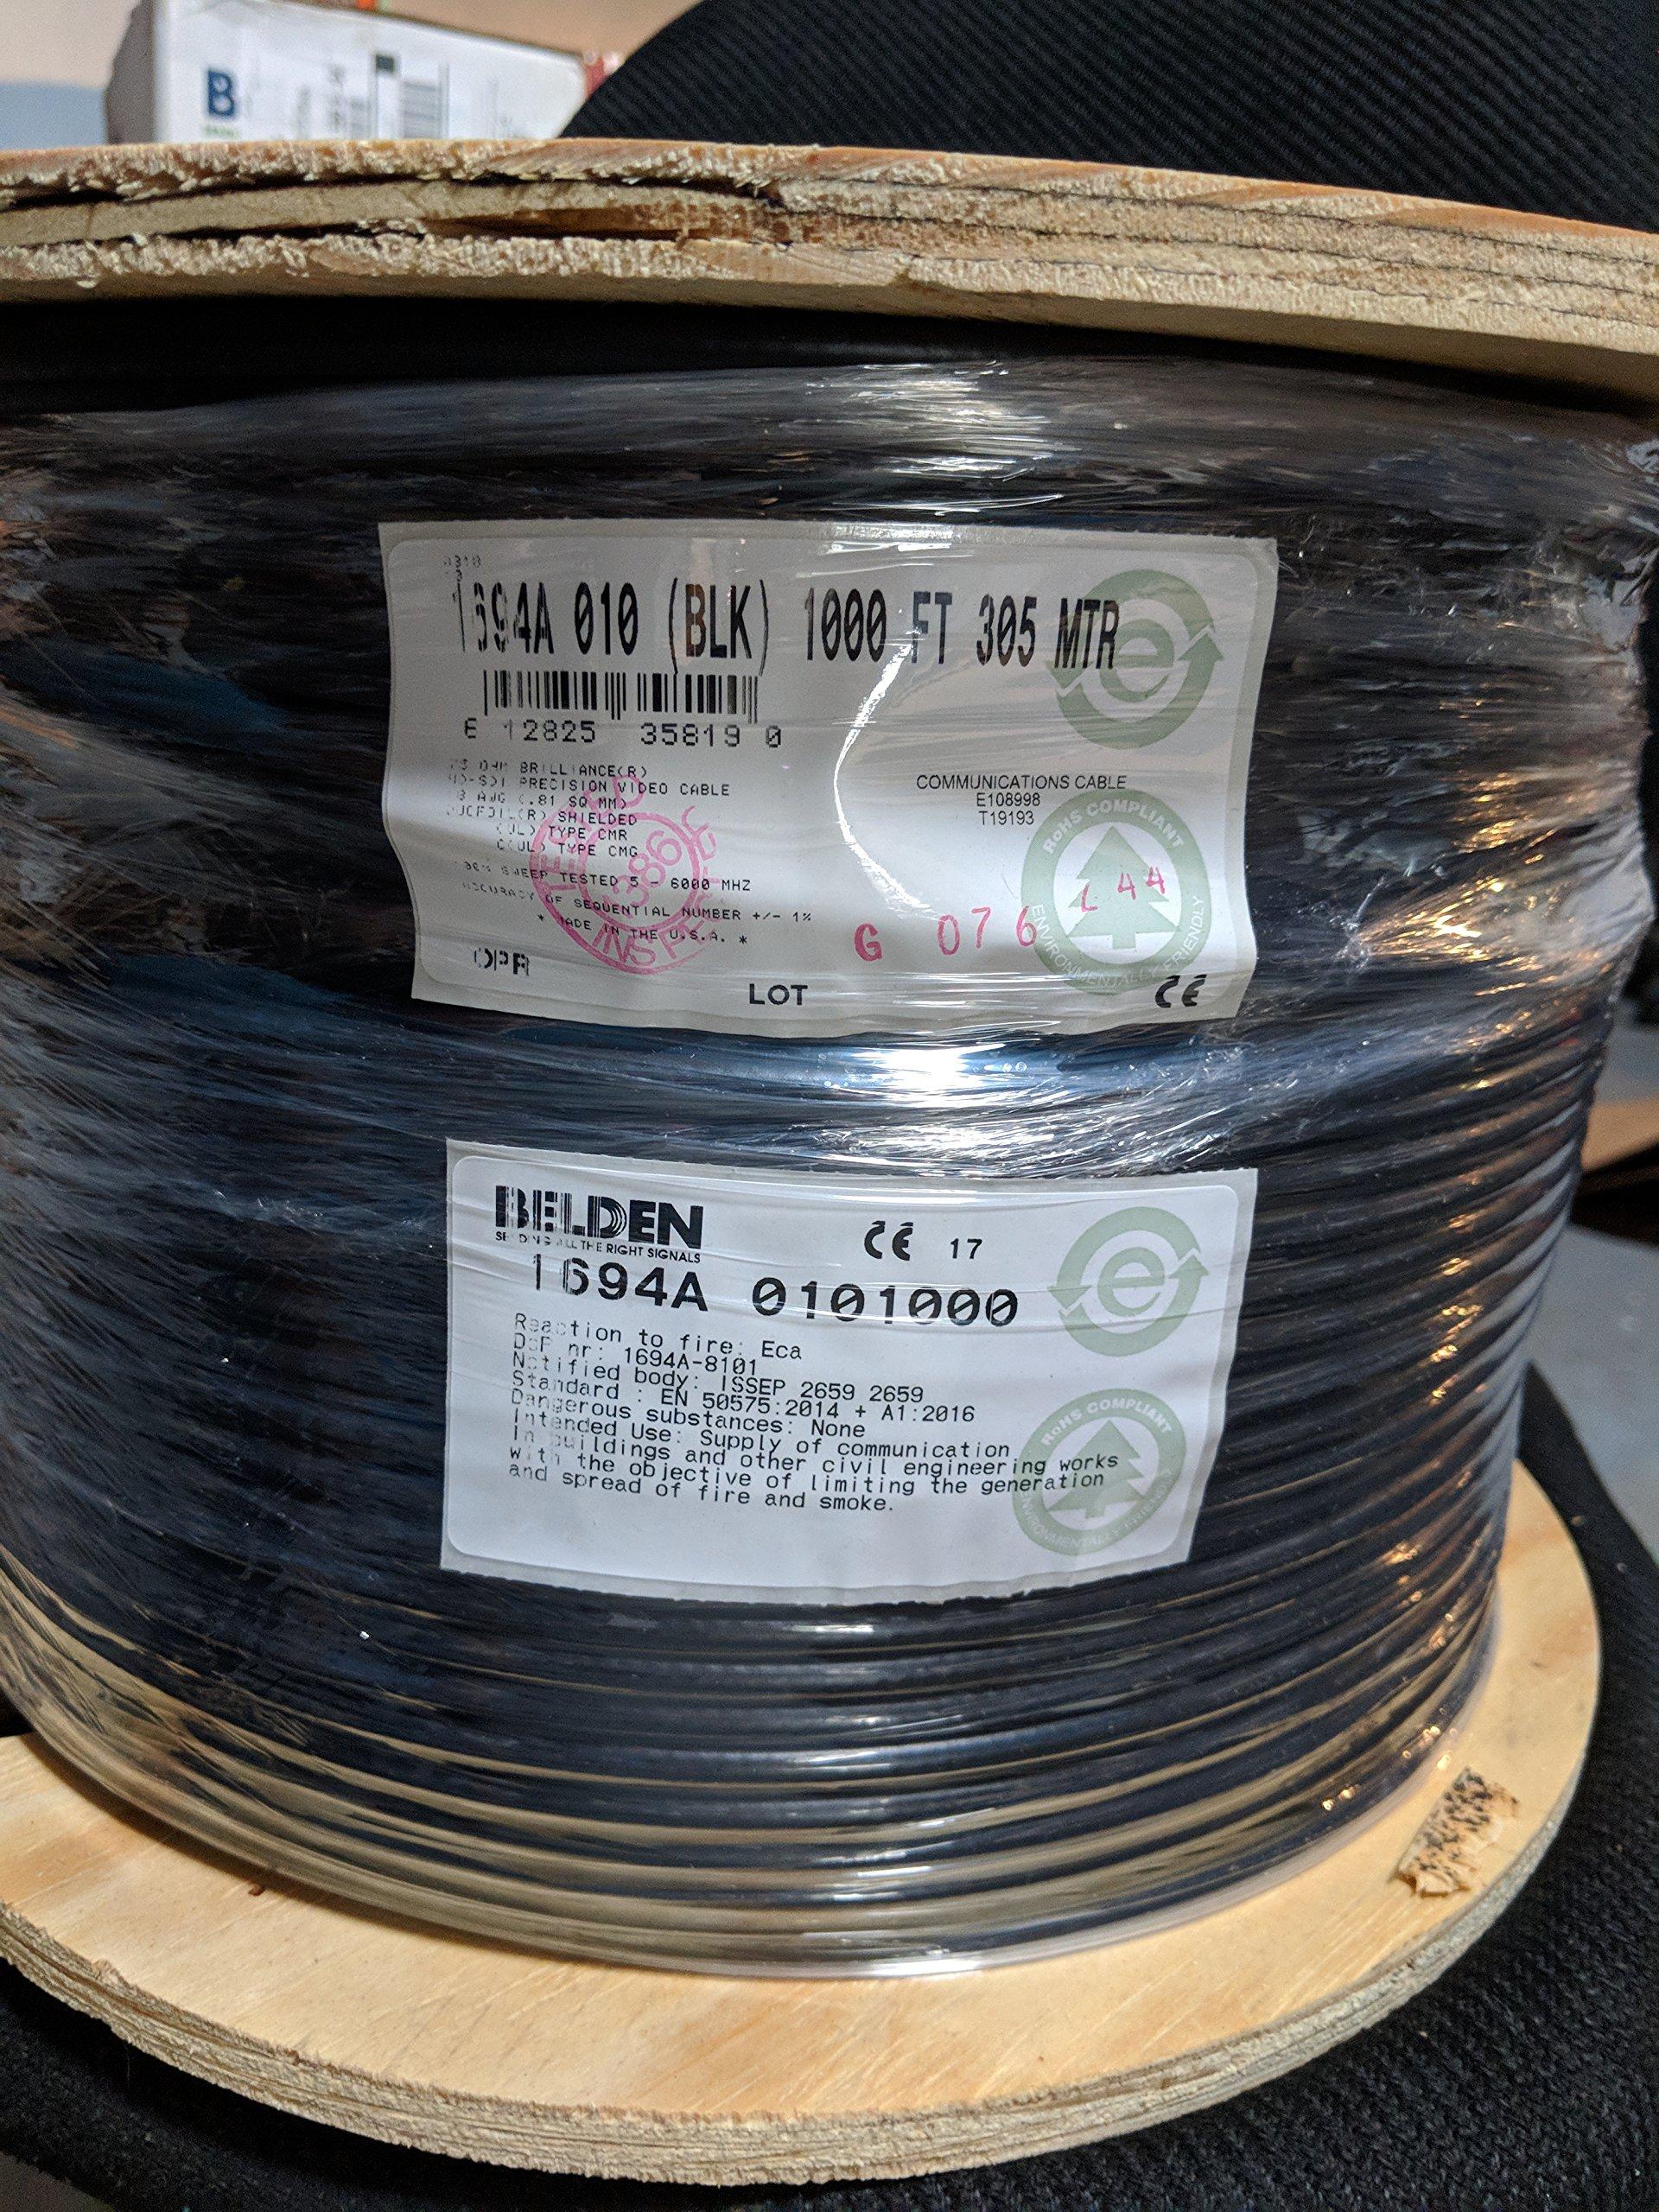 Belden 1694A HD/SDI 18AWG RG6 SerialDigital Coaxial Cable - 1,000 FEET (BLACK)